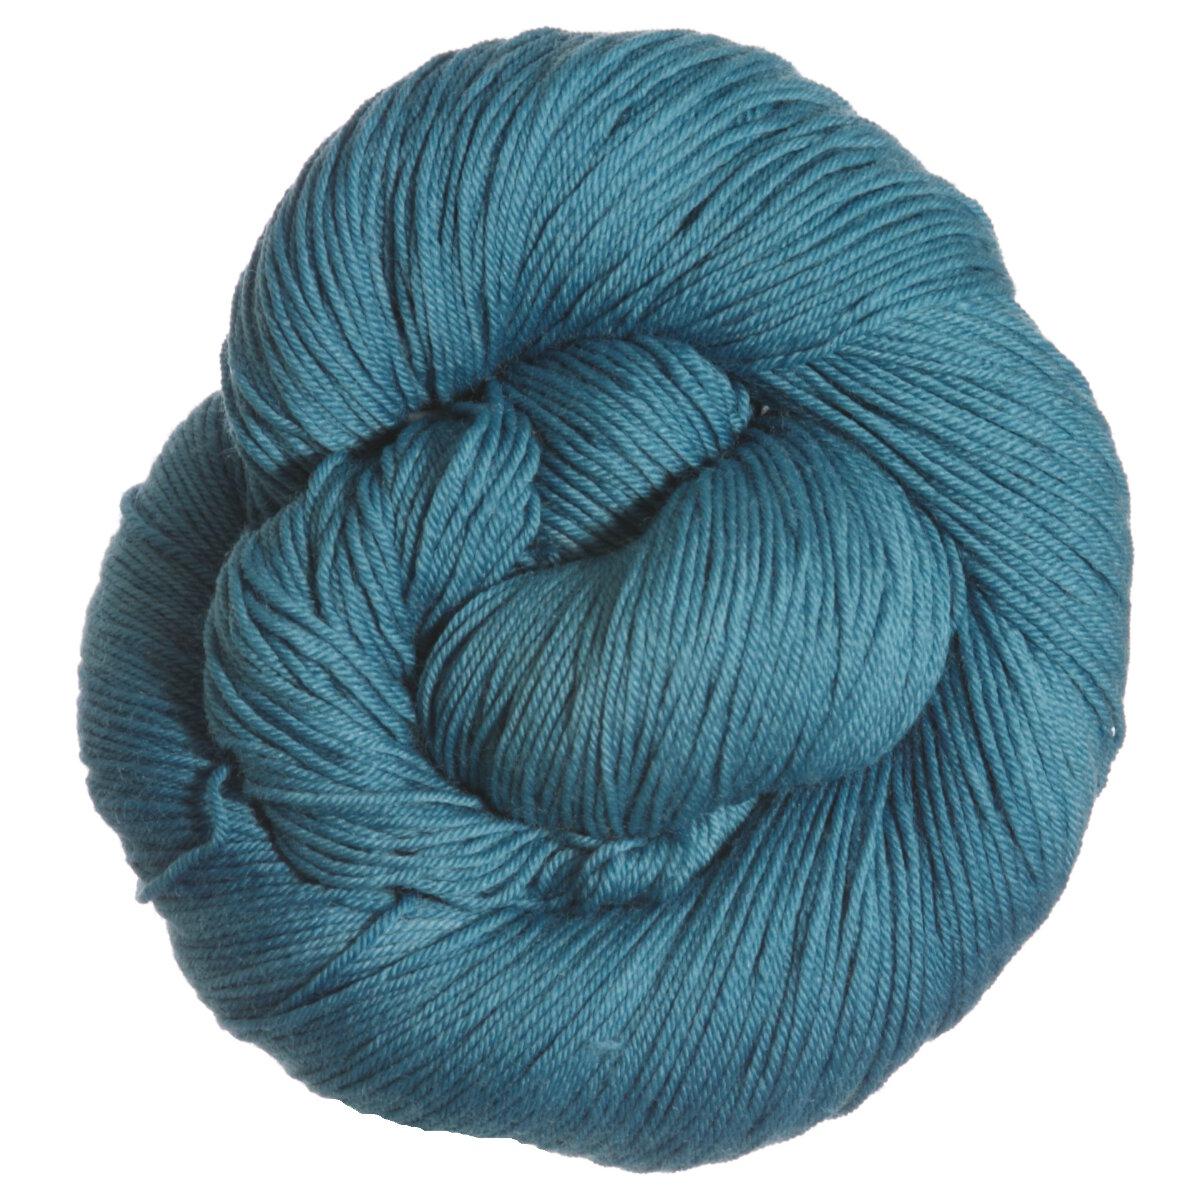 Shepherd Knitting Patterns Free : Lornas Laces Shepherd Sock Yarn - Turquoise Reviews at Jimmy Beans Wool